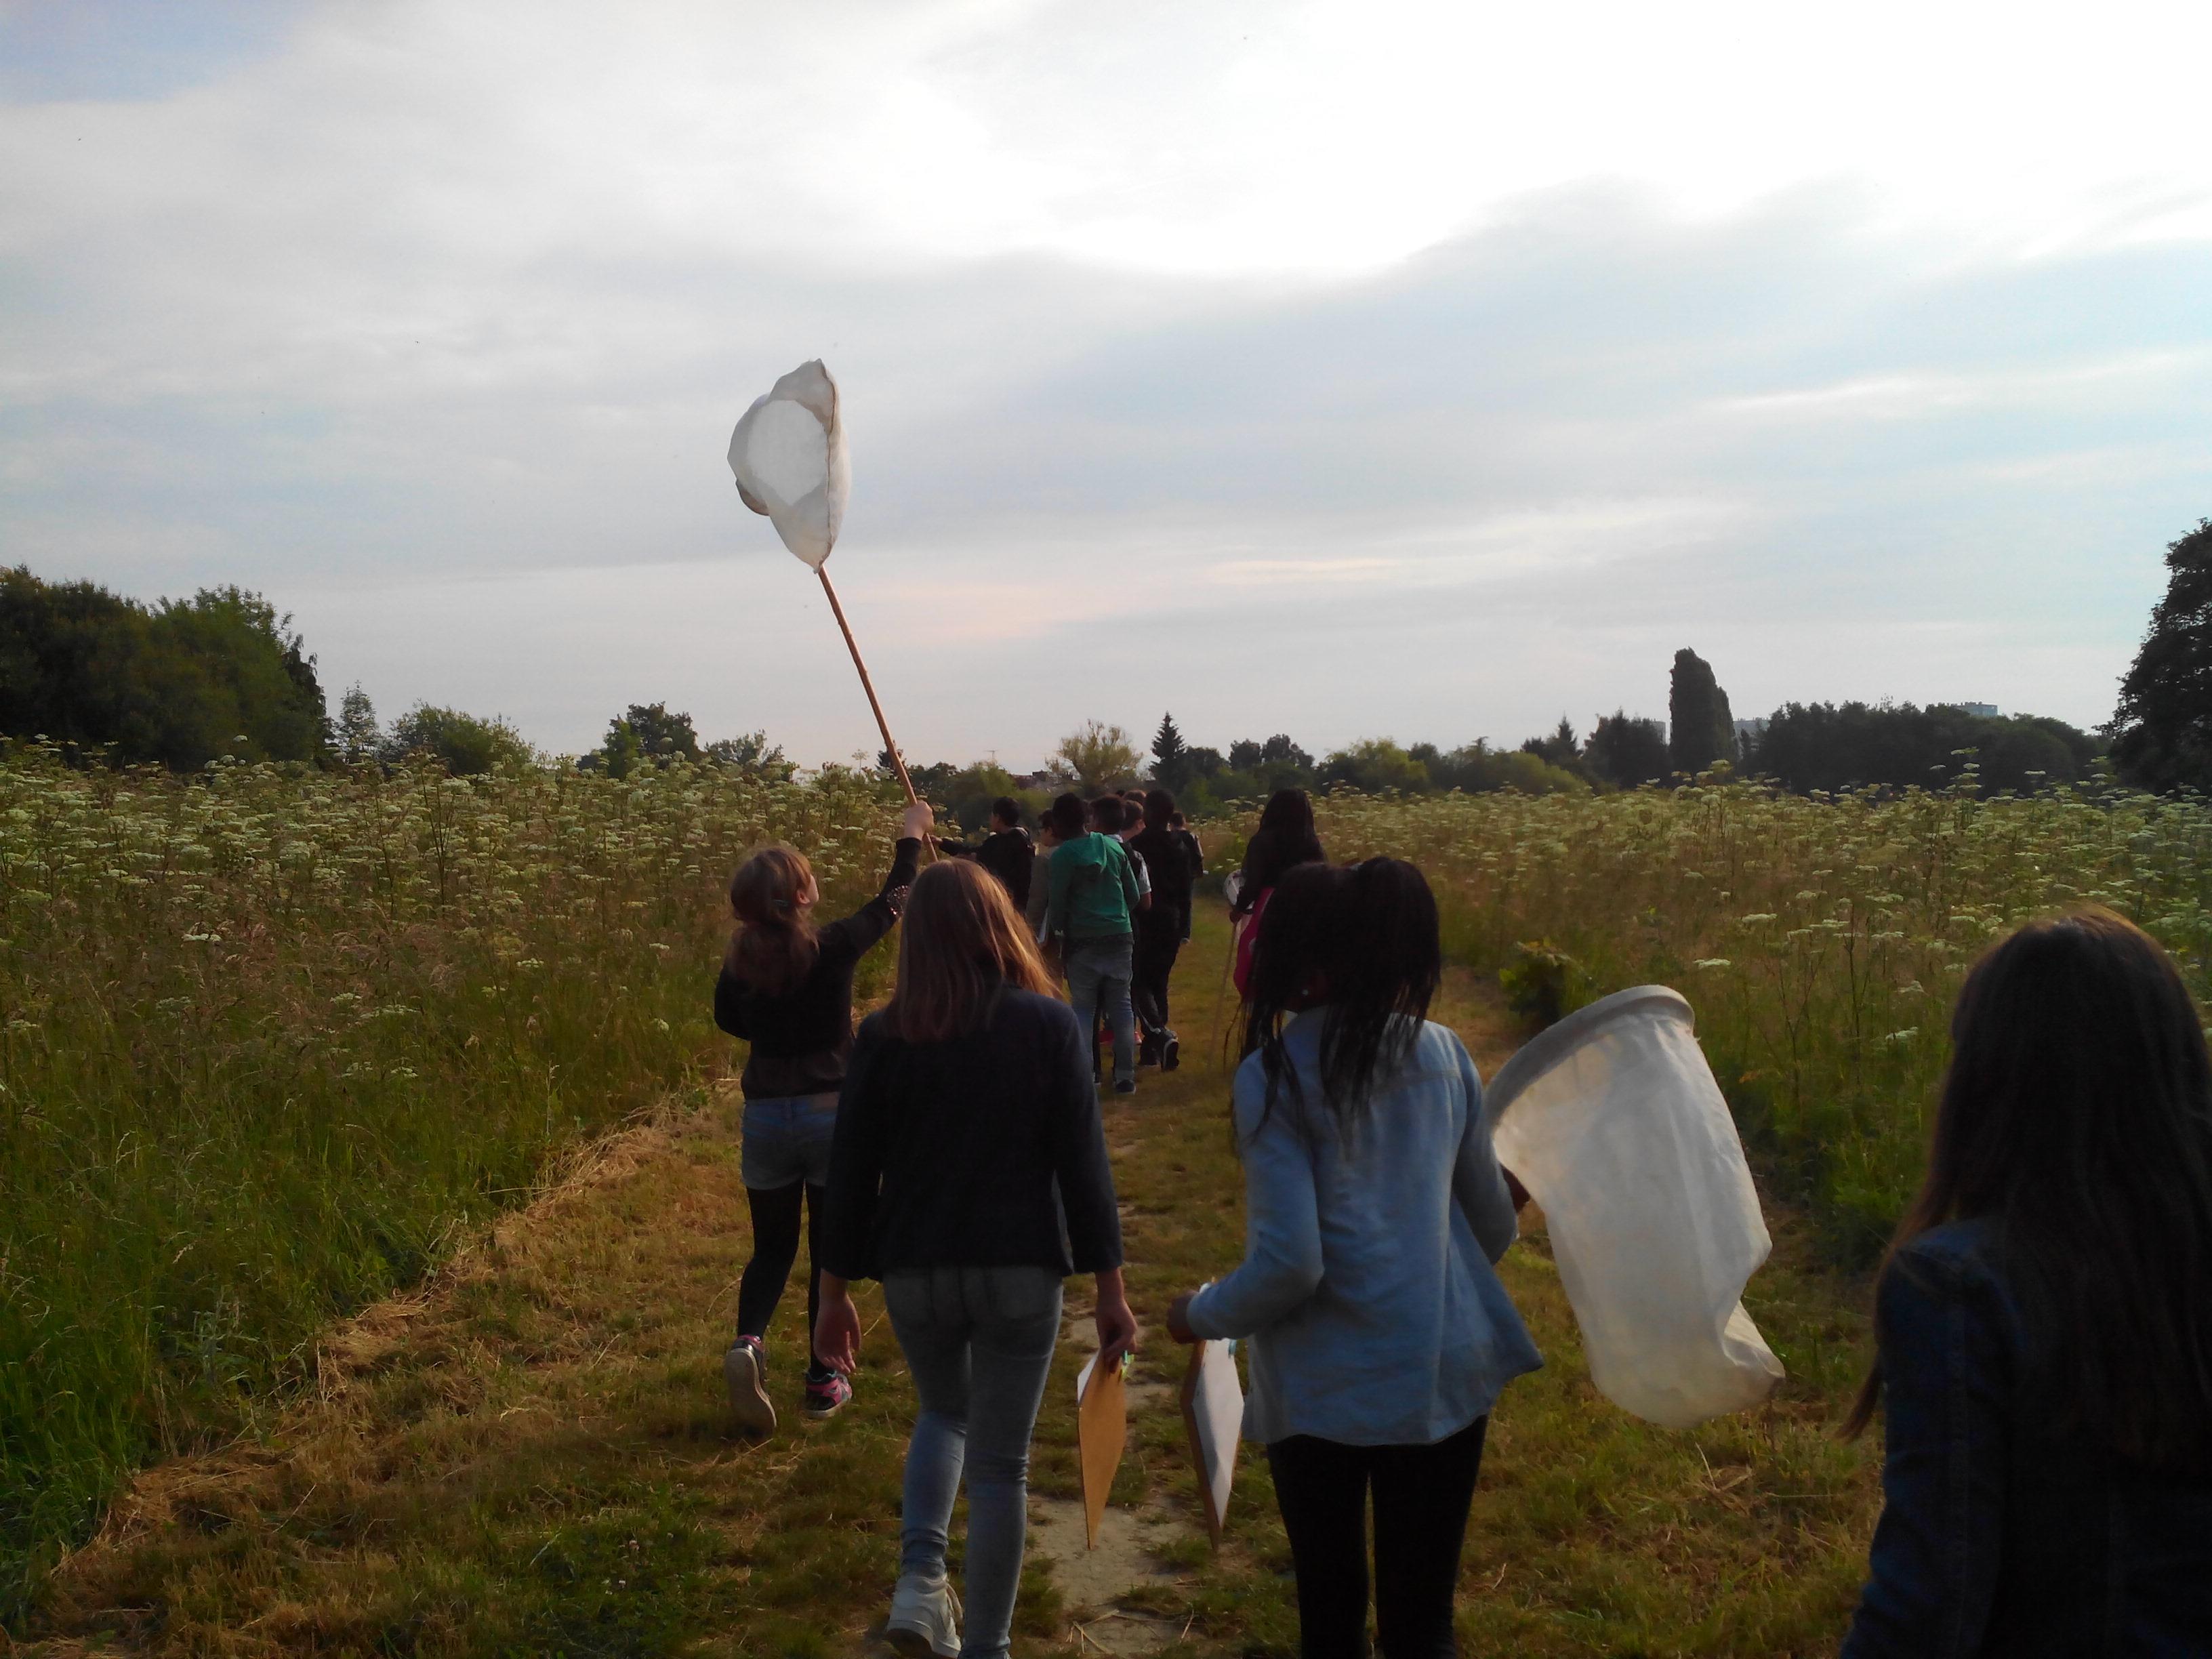 sortie pollinisateurs SVT 6eme